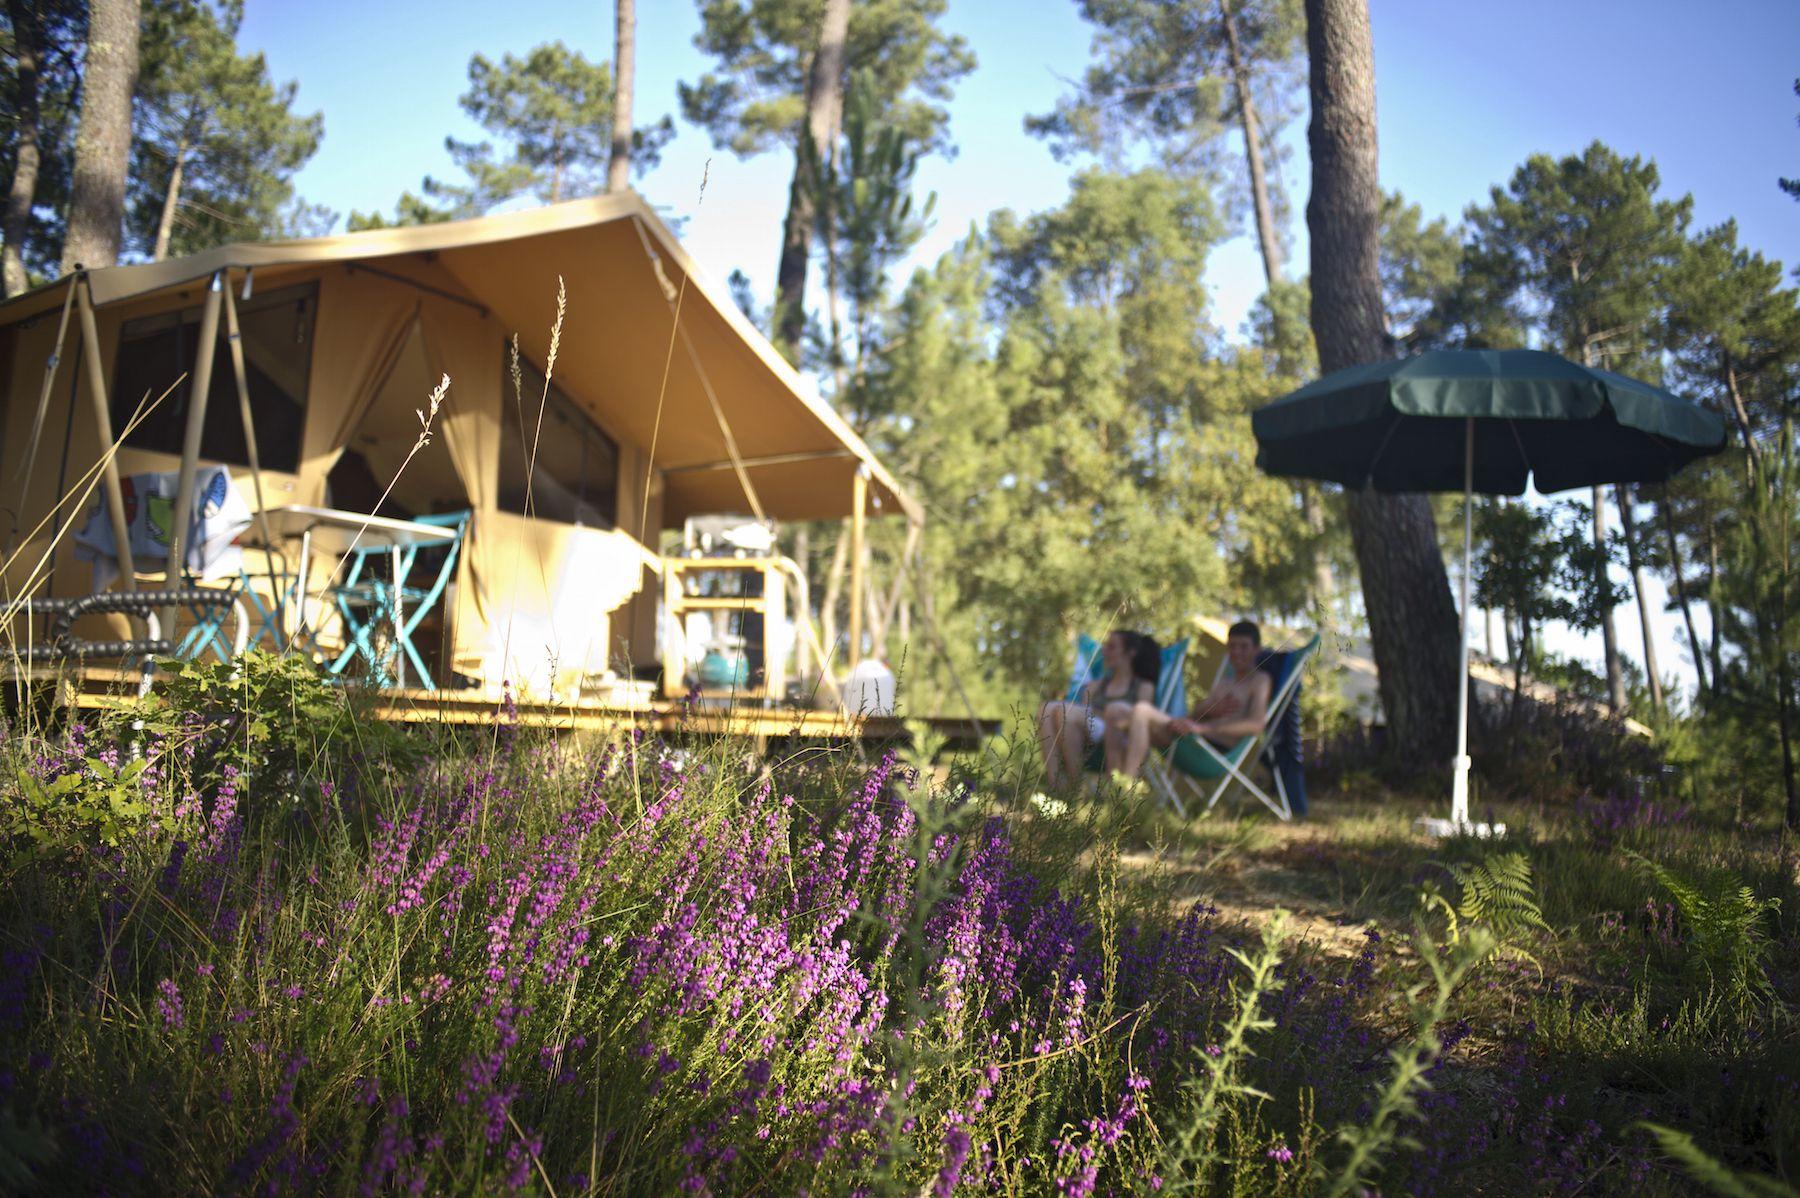 Campsites in Landes